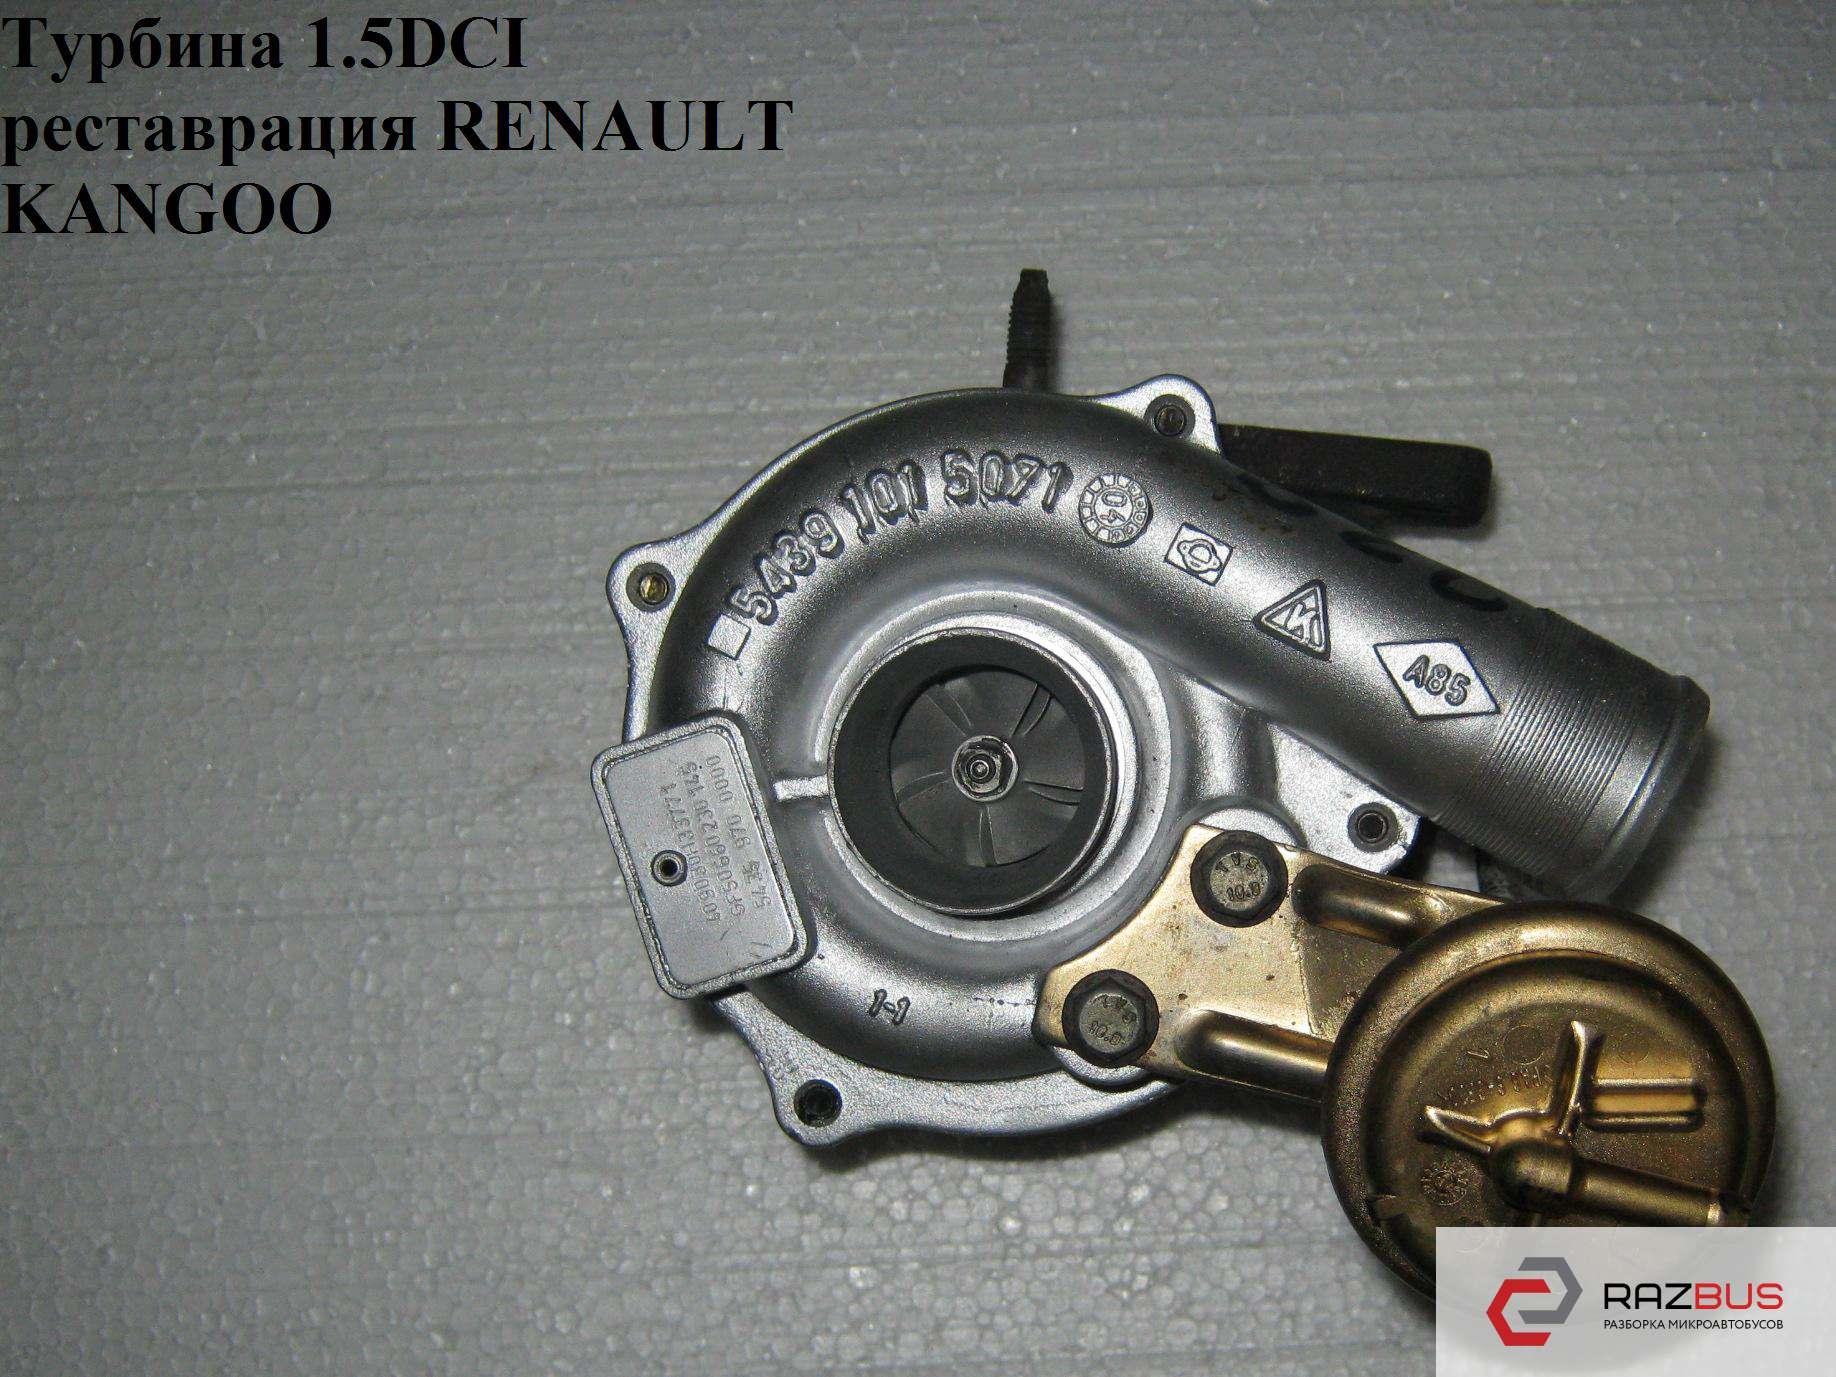 54359700000, 54399700030 Турбина 1.5DCI реставрация RENAULT KANGOO 1997-2007г